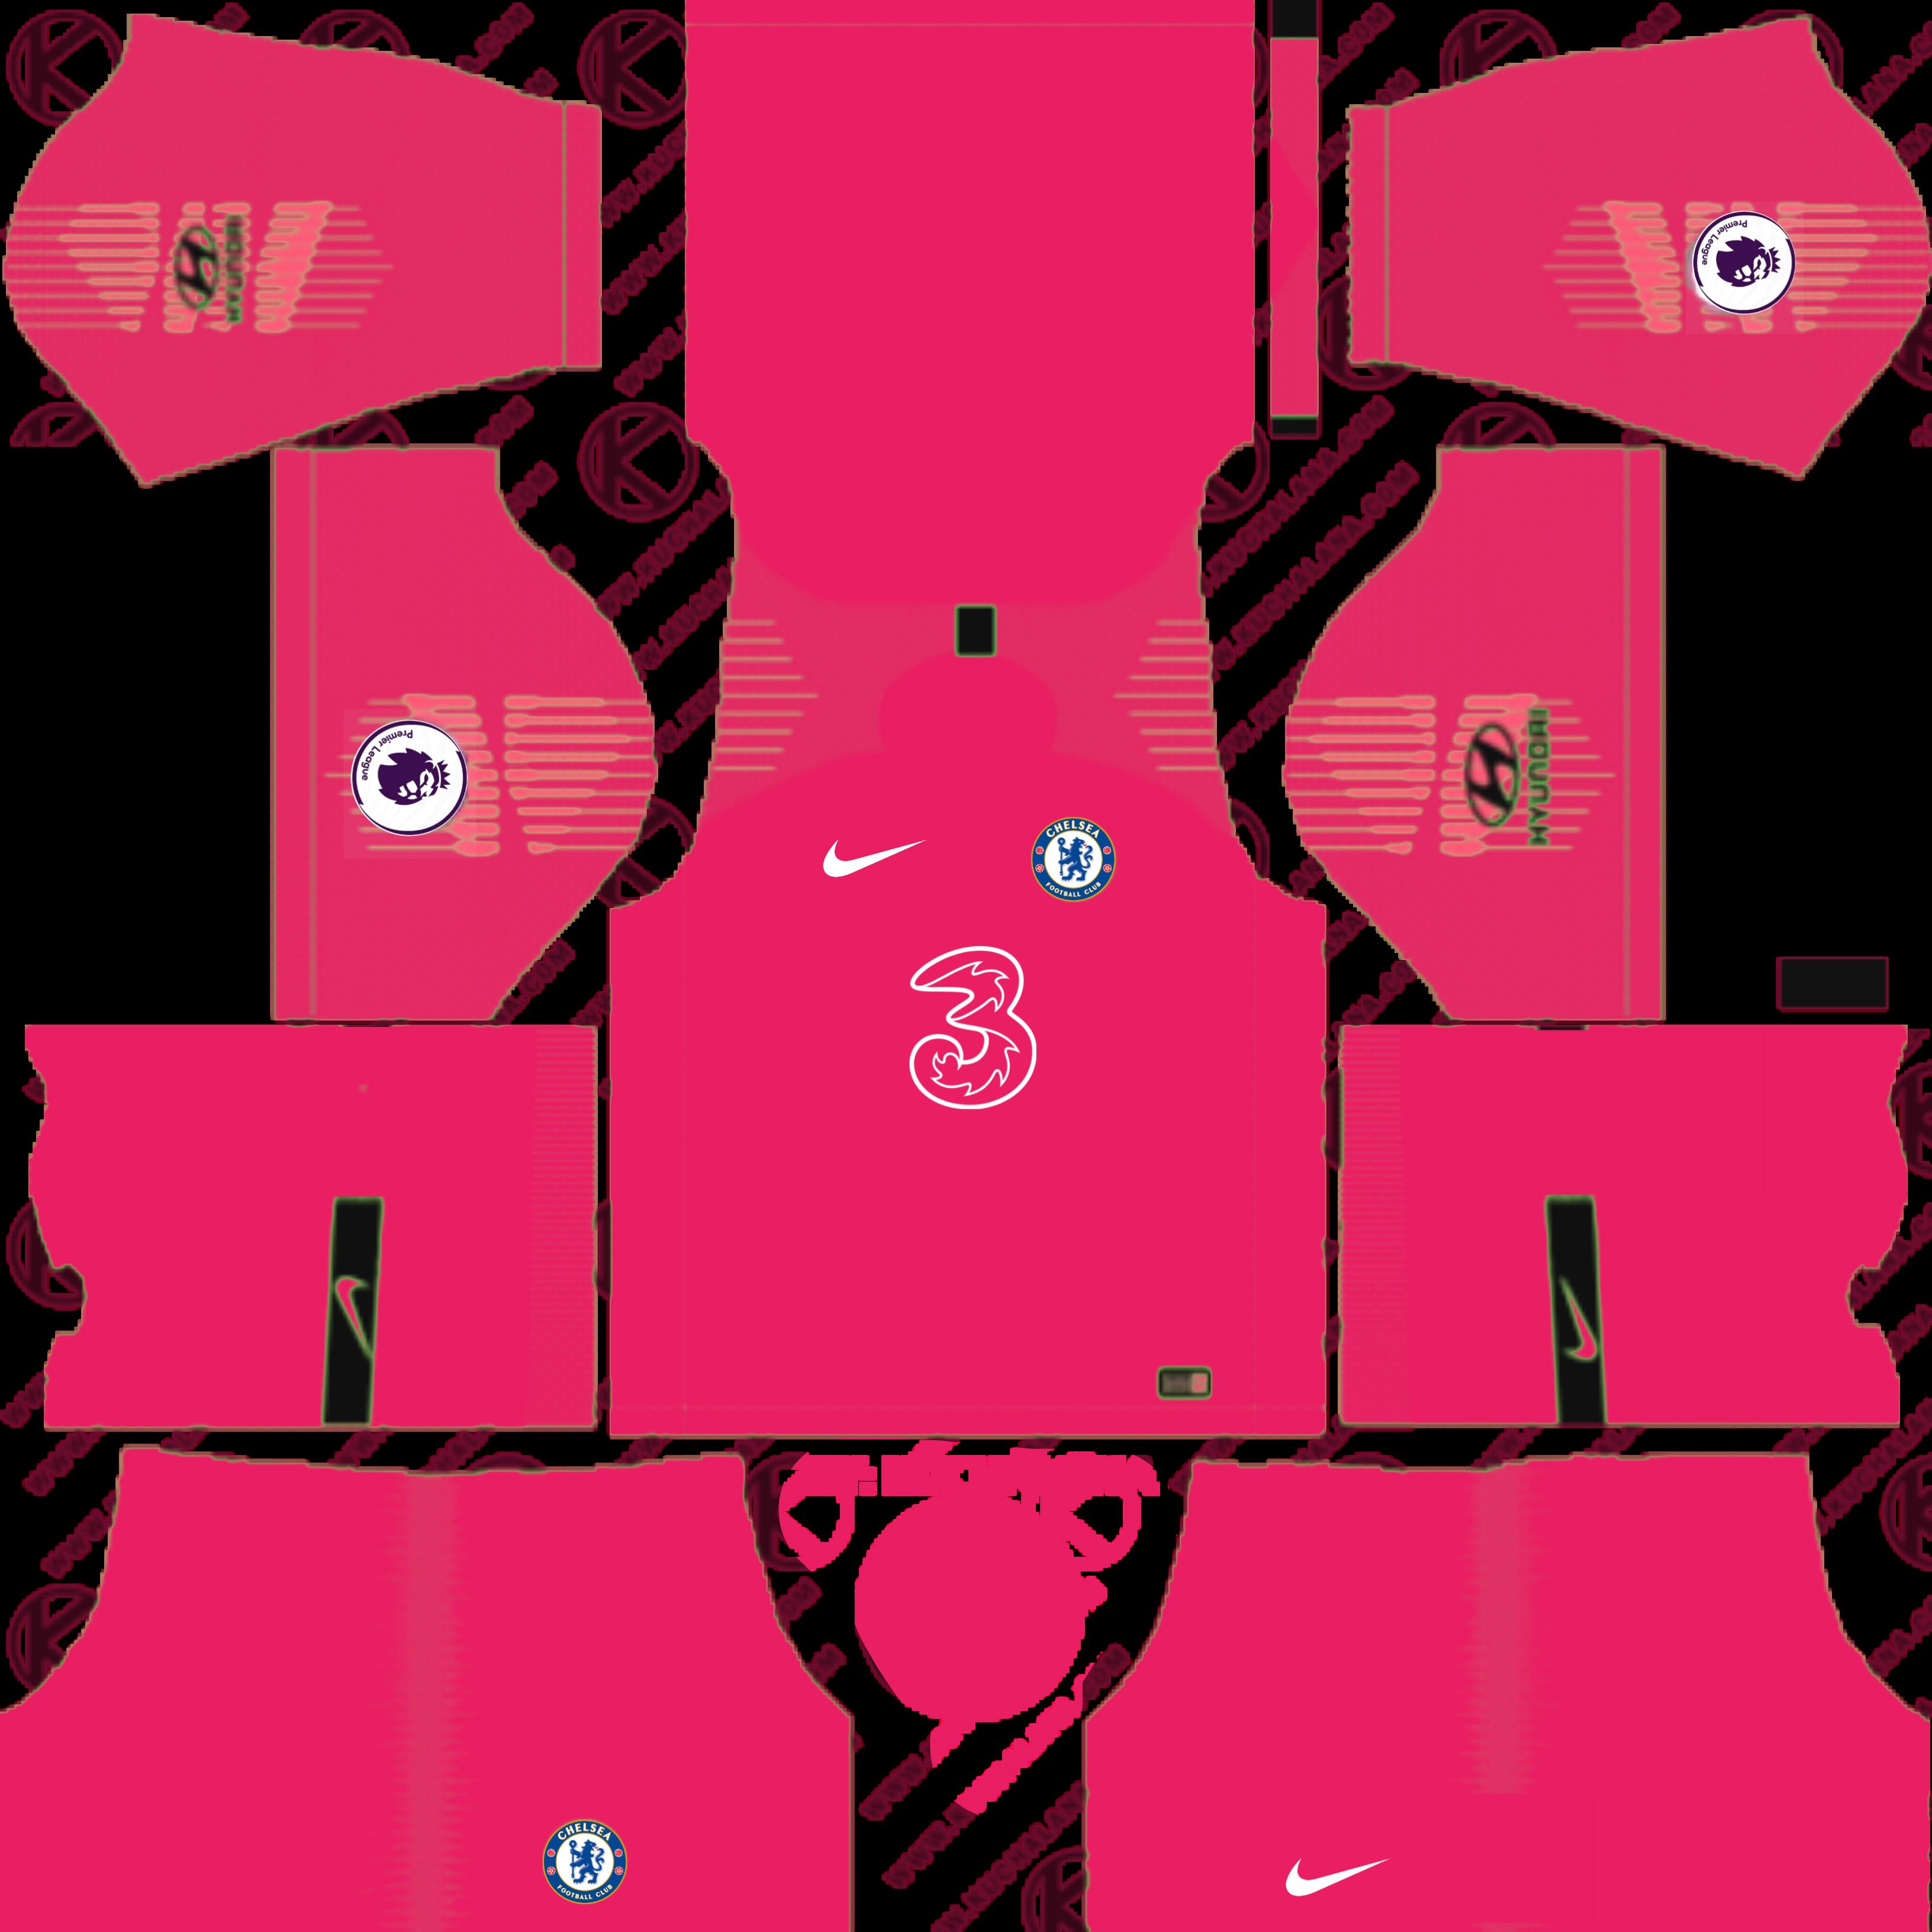 Dls 21 Chelsea Kits 2021 Dream League Soccer Tedicted Com In 2020 Liverpool Kit Premier League Soccer Soccer Kits